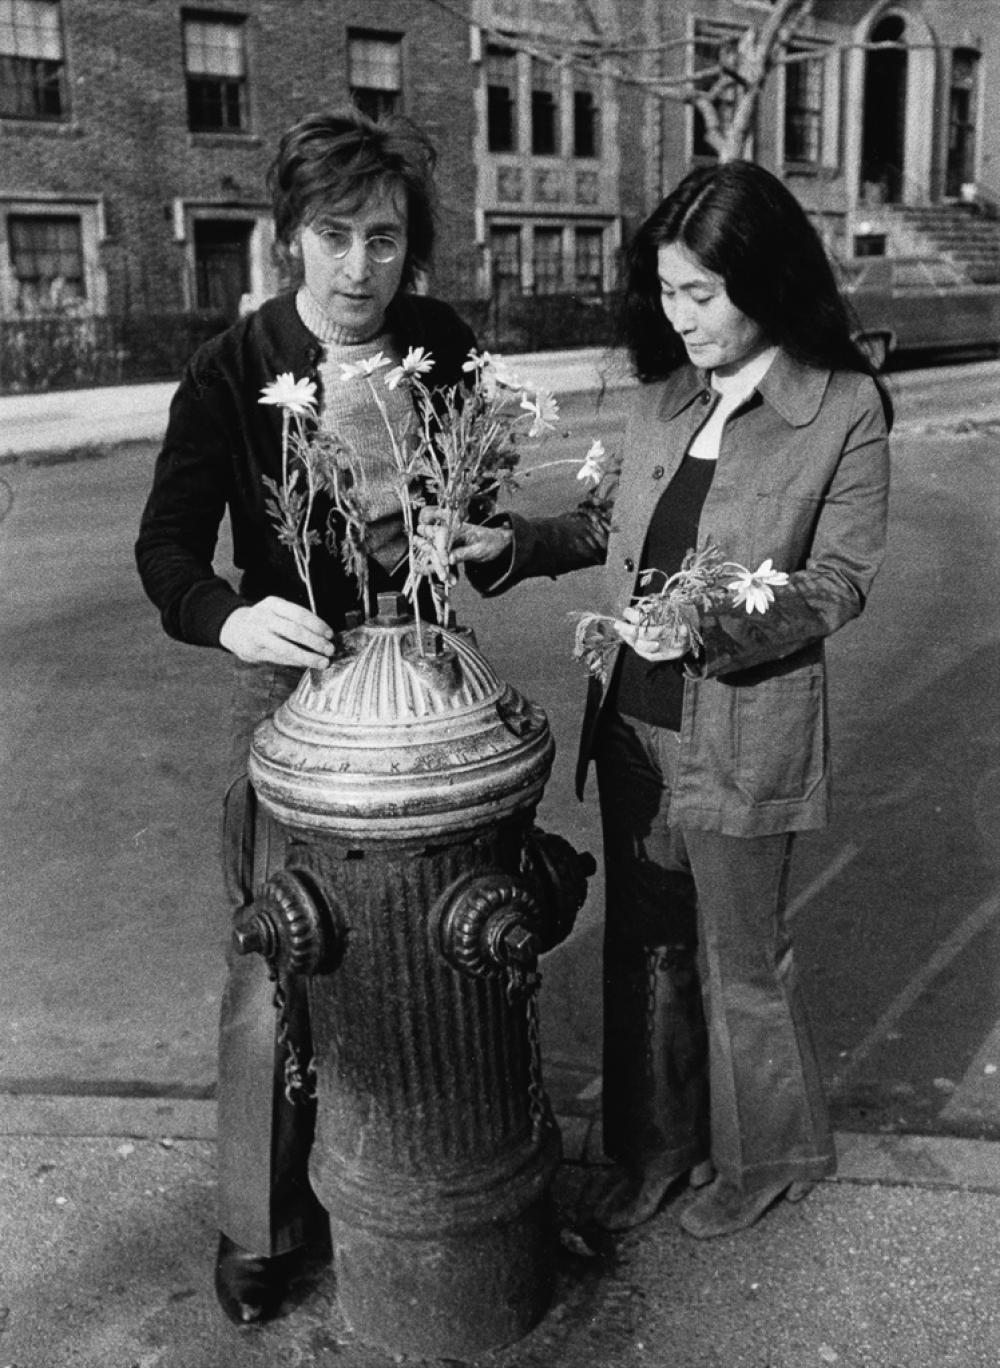 BEN ROSS (1916-2004) John and Yoko Lennon, Brooklyn, New York.